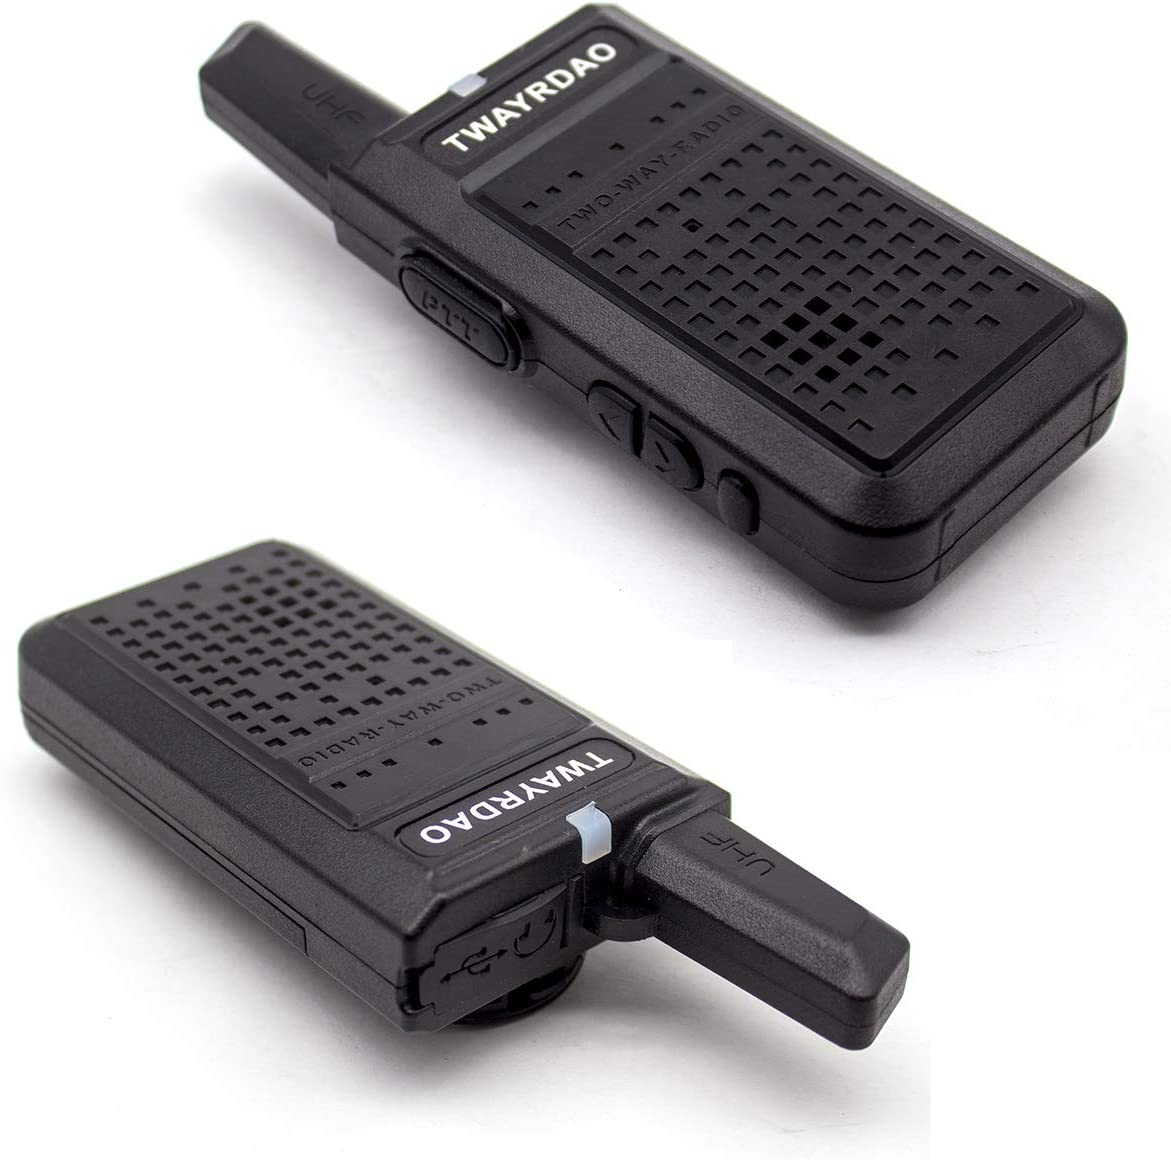 2 Pack TWAYRDIO Mini Two Way Radio 2W UHF 400-470Mhz Long Range Walkie Talkie 16 Channels Small Handheld Radio for Kids//Adults